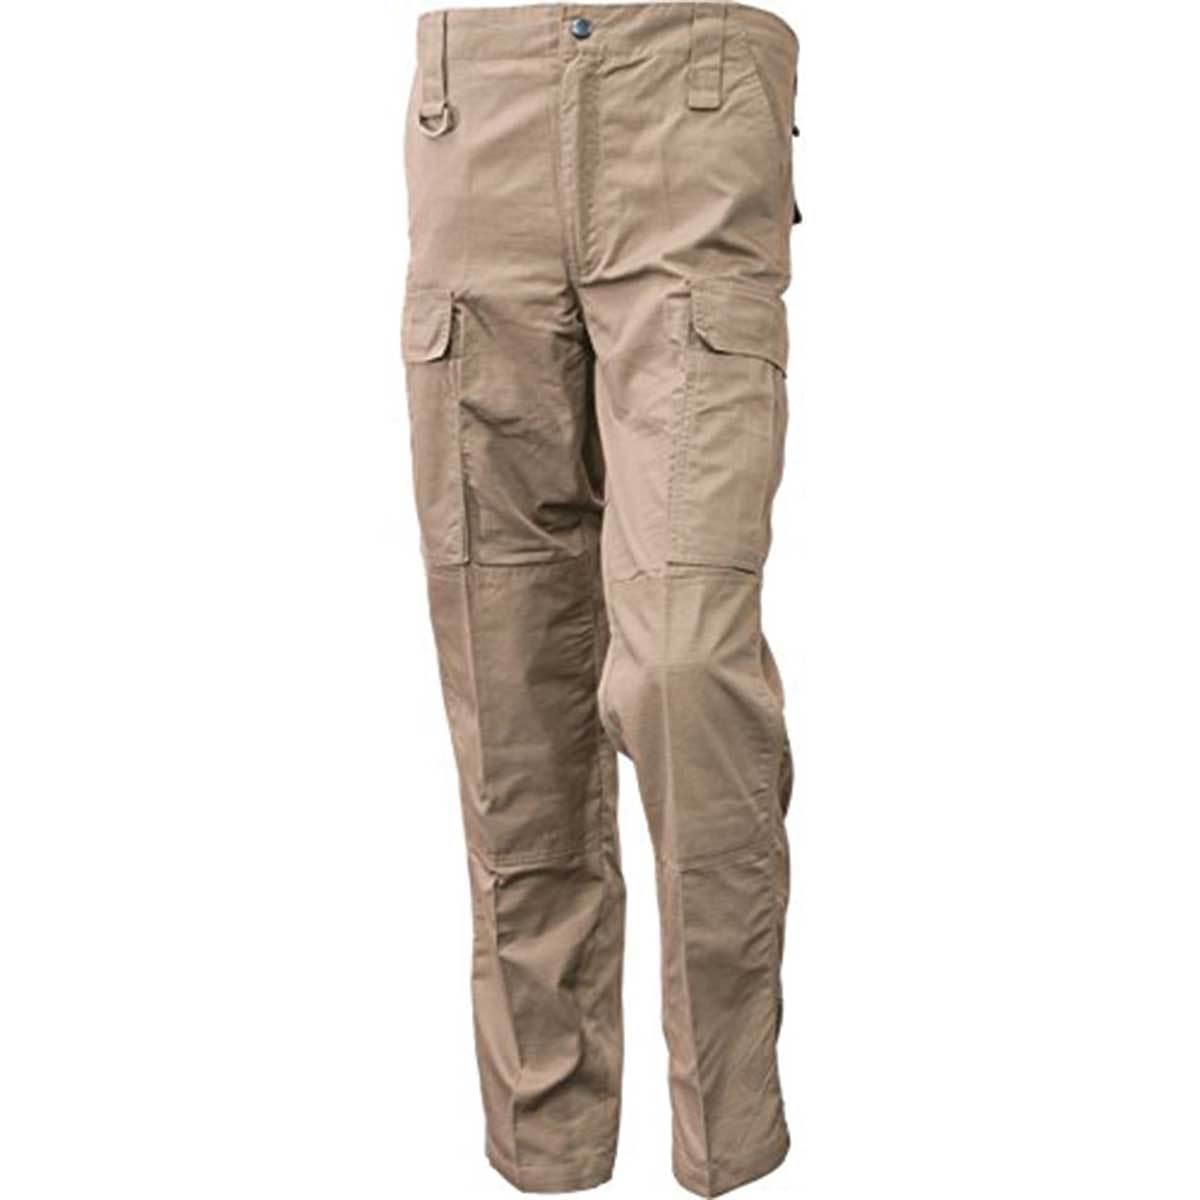 Tippmann Tactical TDU Pants - Tan - Large